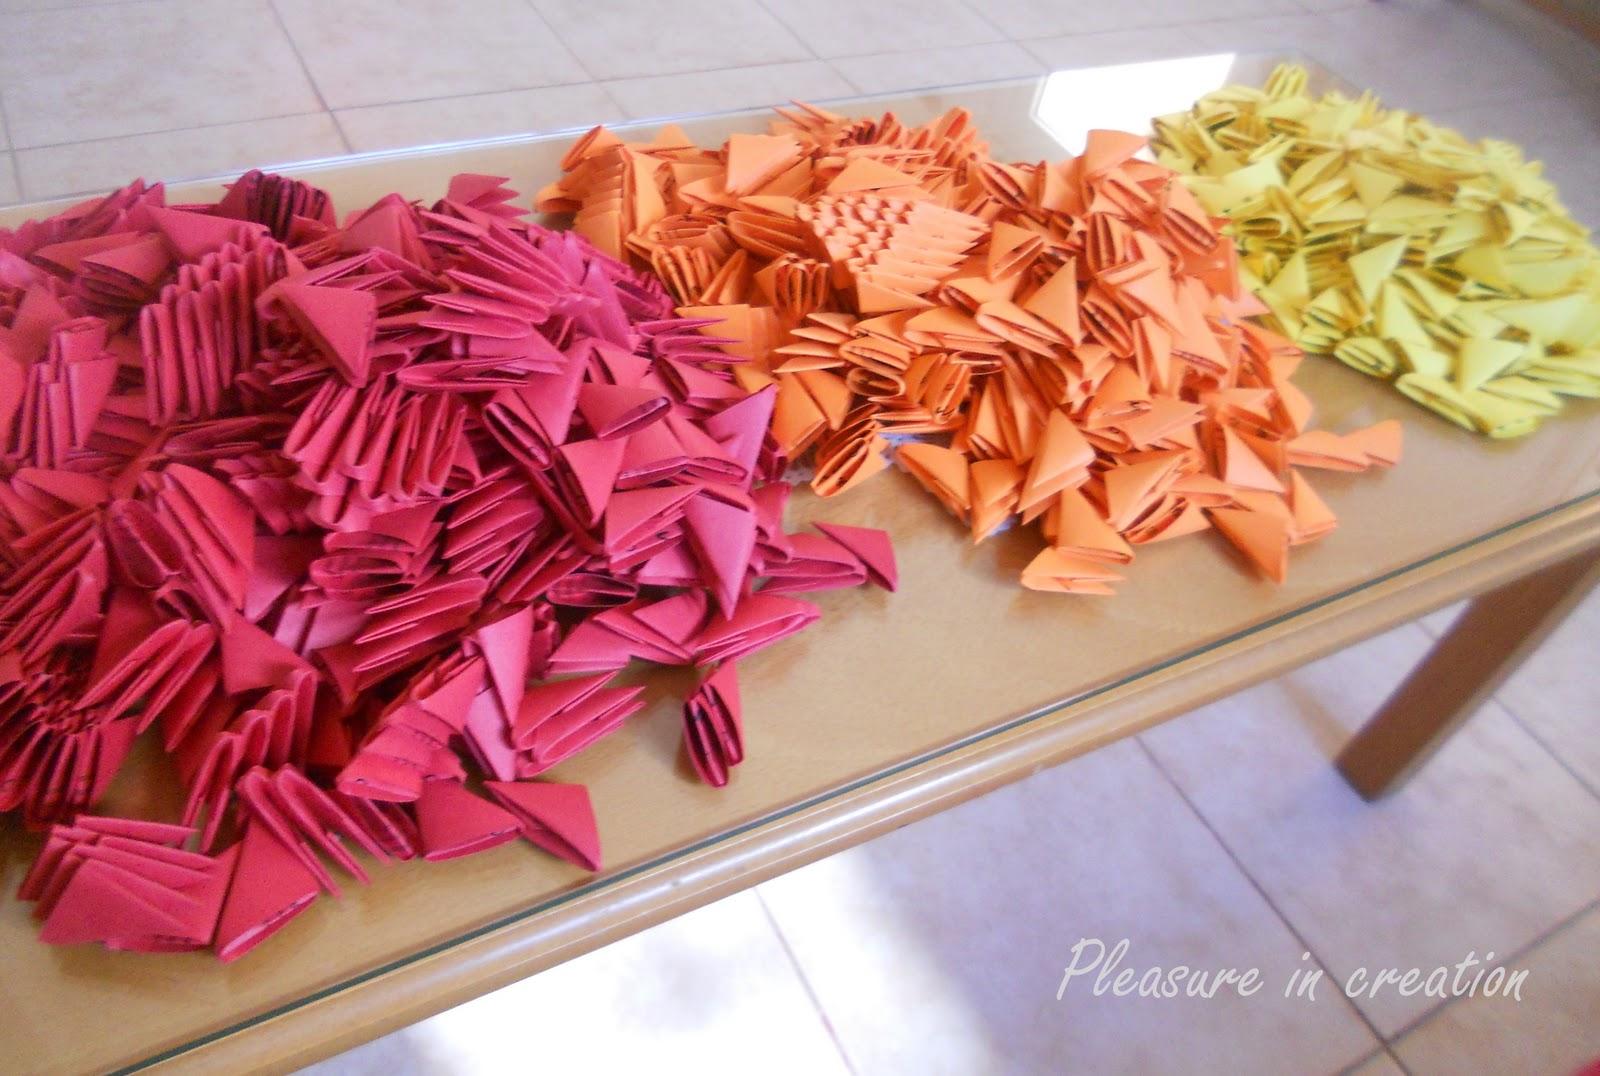 flower vase | Origami diagrams, Origami paper, Origami vase easy | 1076x1600